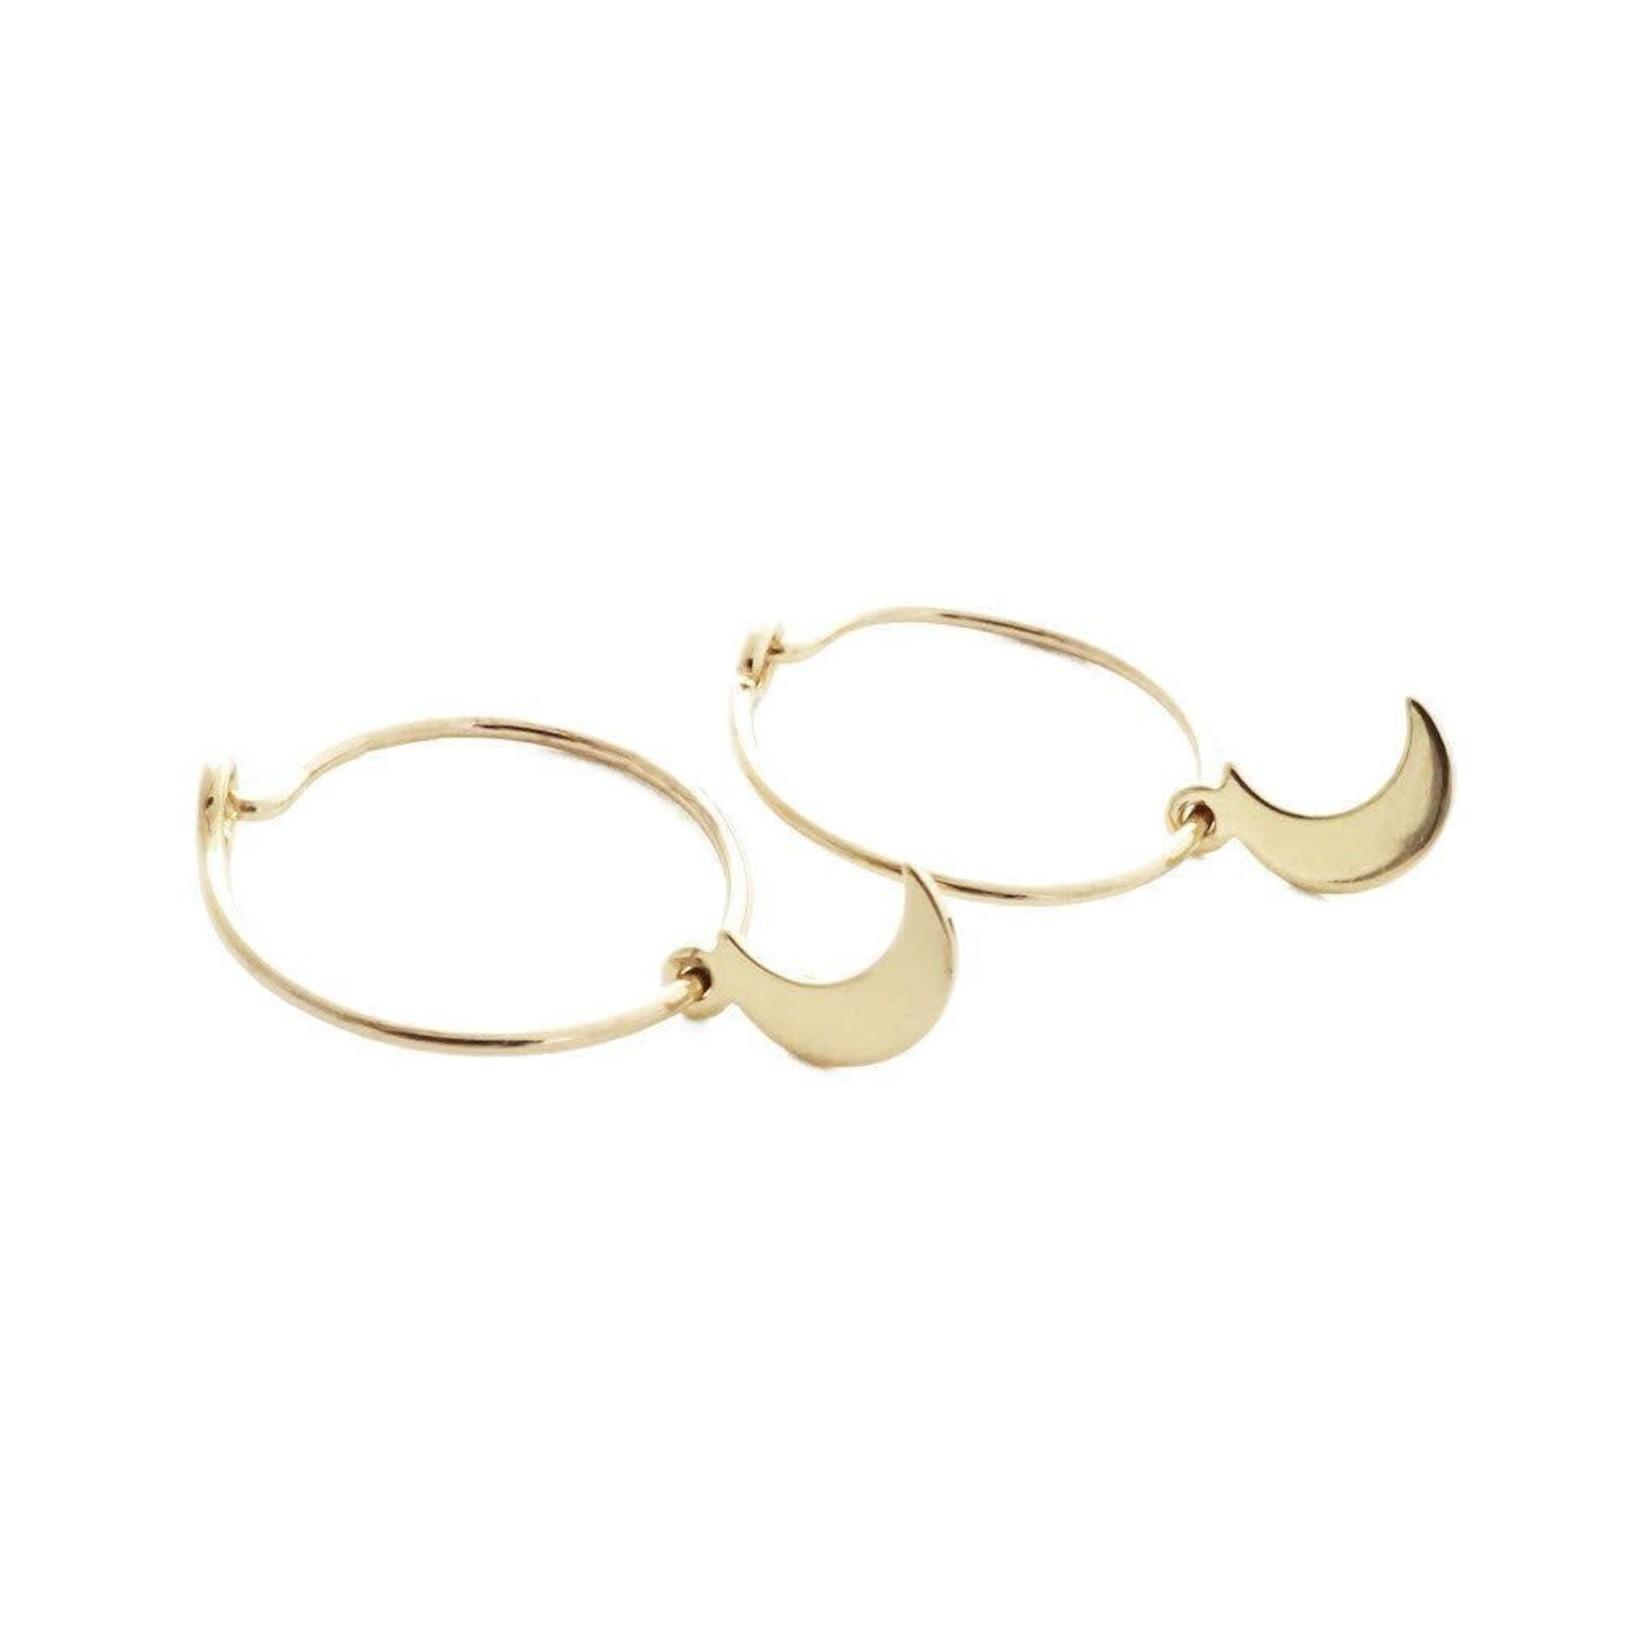 Honeycat Jewelry Honeycat Magic Charm Moon Hoops Earrings